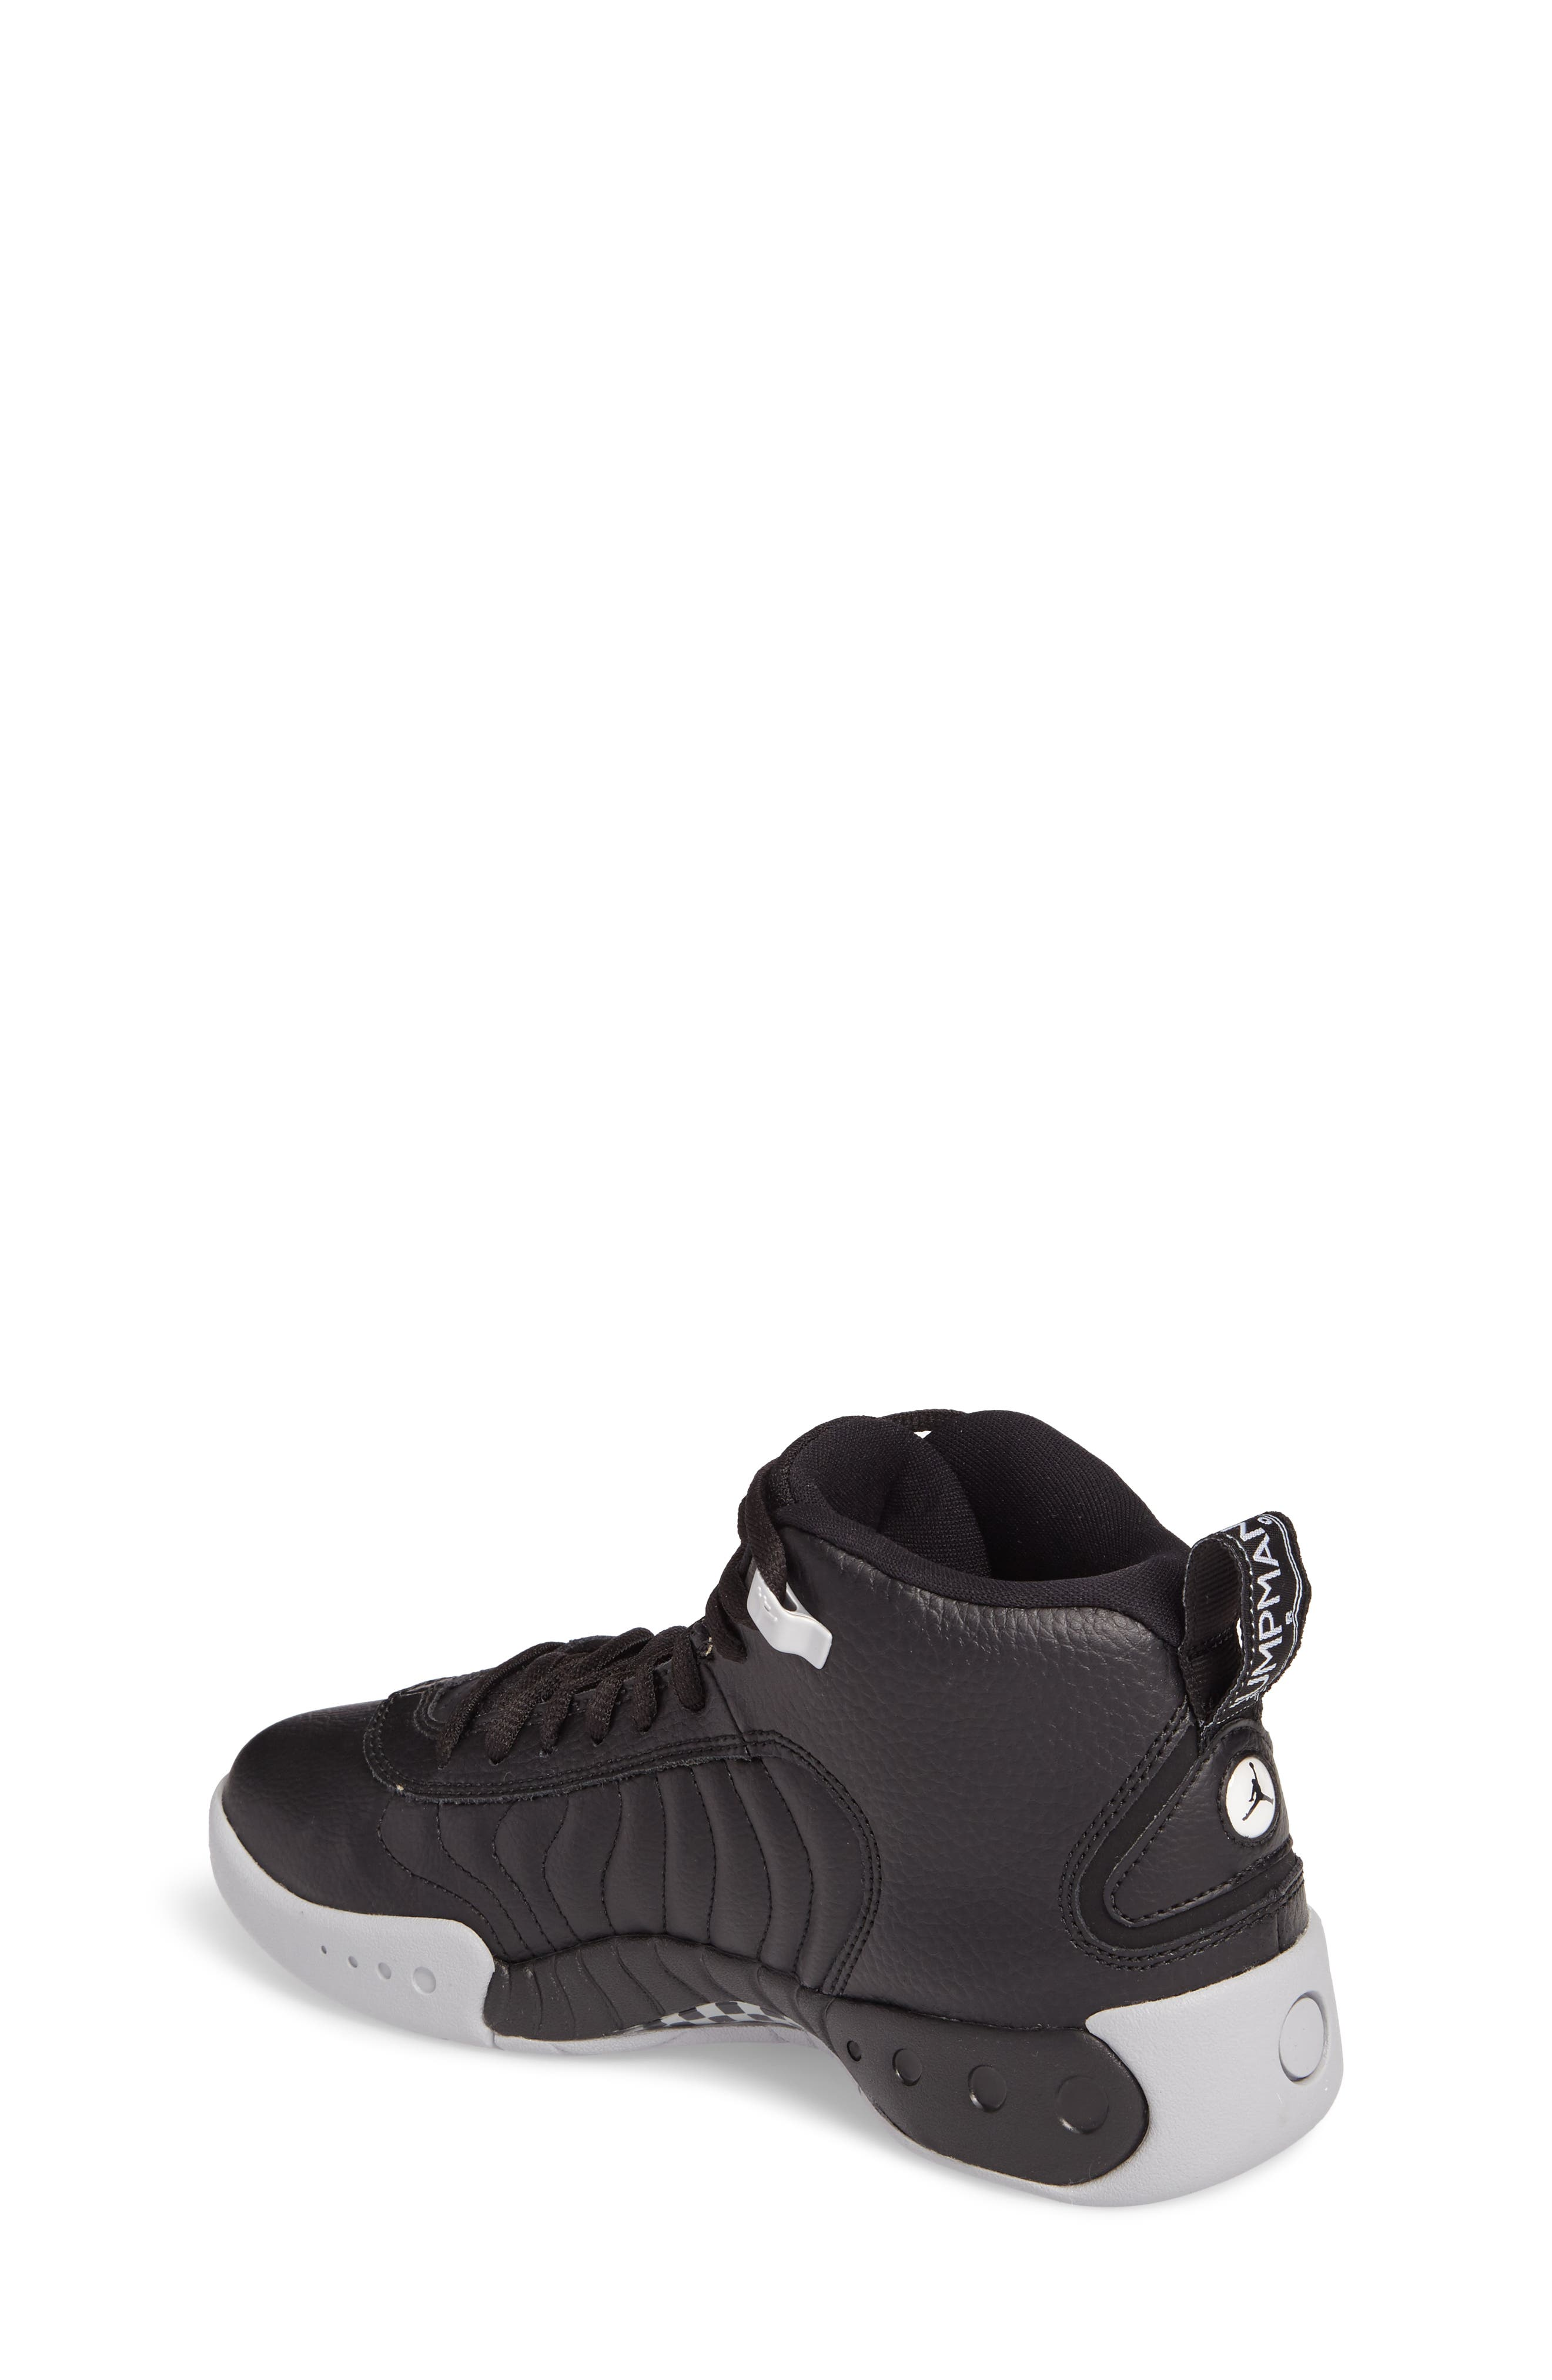 Jumpman Pro BG Mid Top Sneaker,                             Alternate thumbnail 2, color,                             012